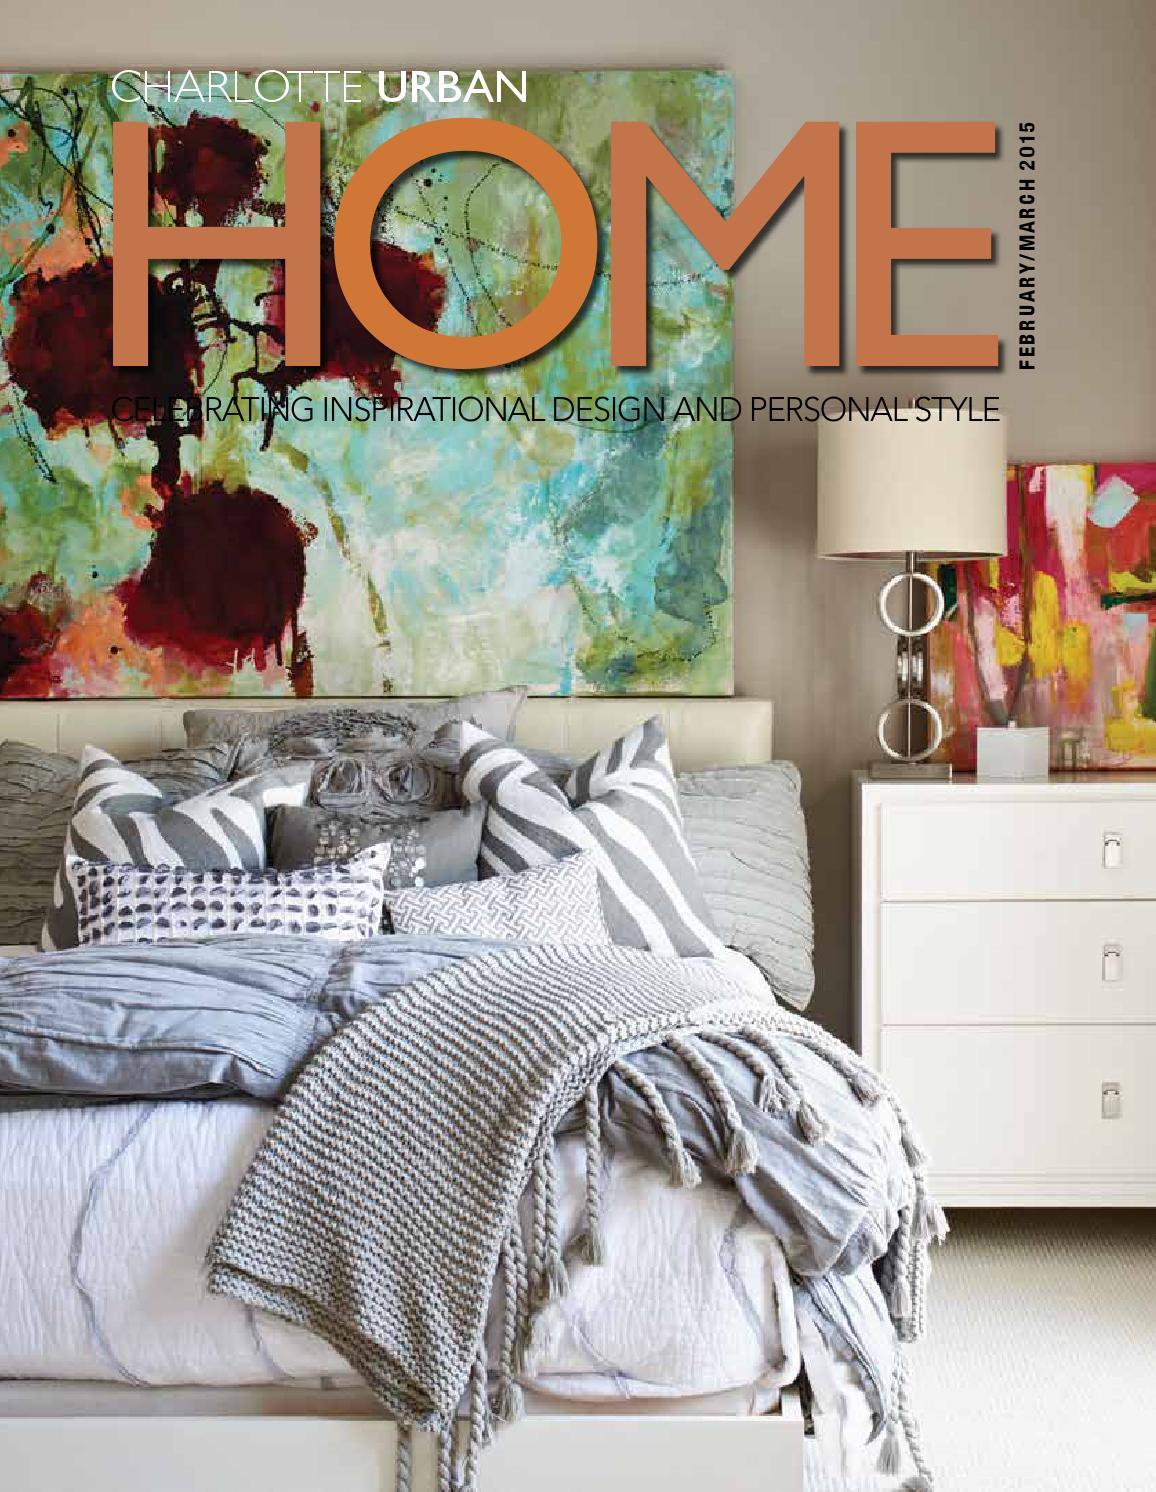 Charlotte Urban Home Magazine Feb./Mar. 2015 by Home ...